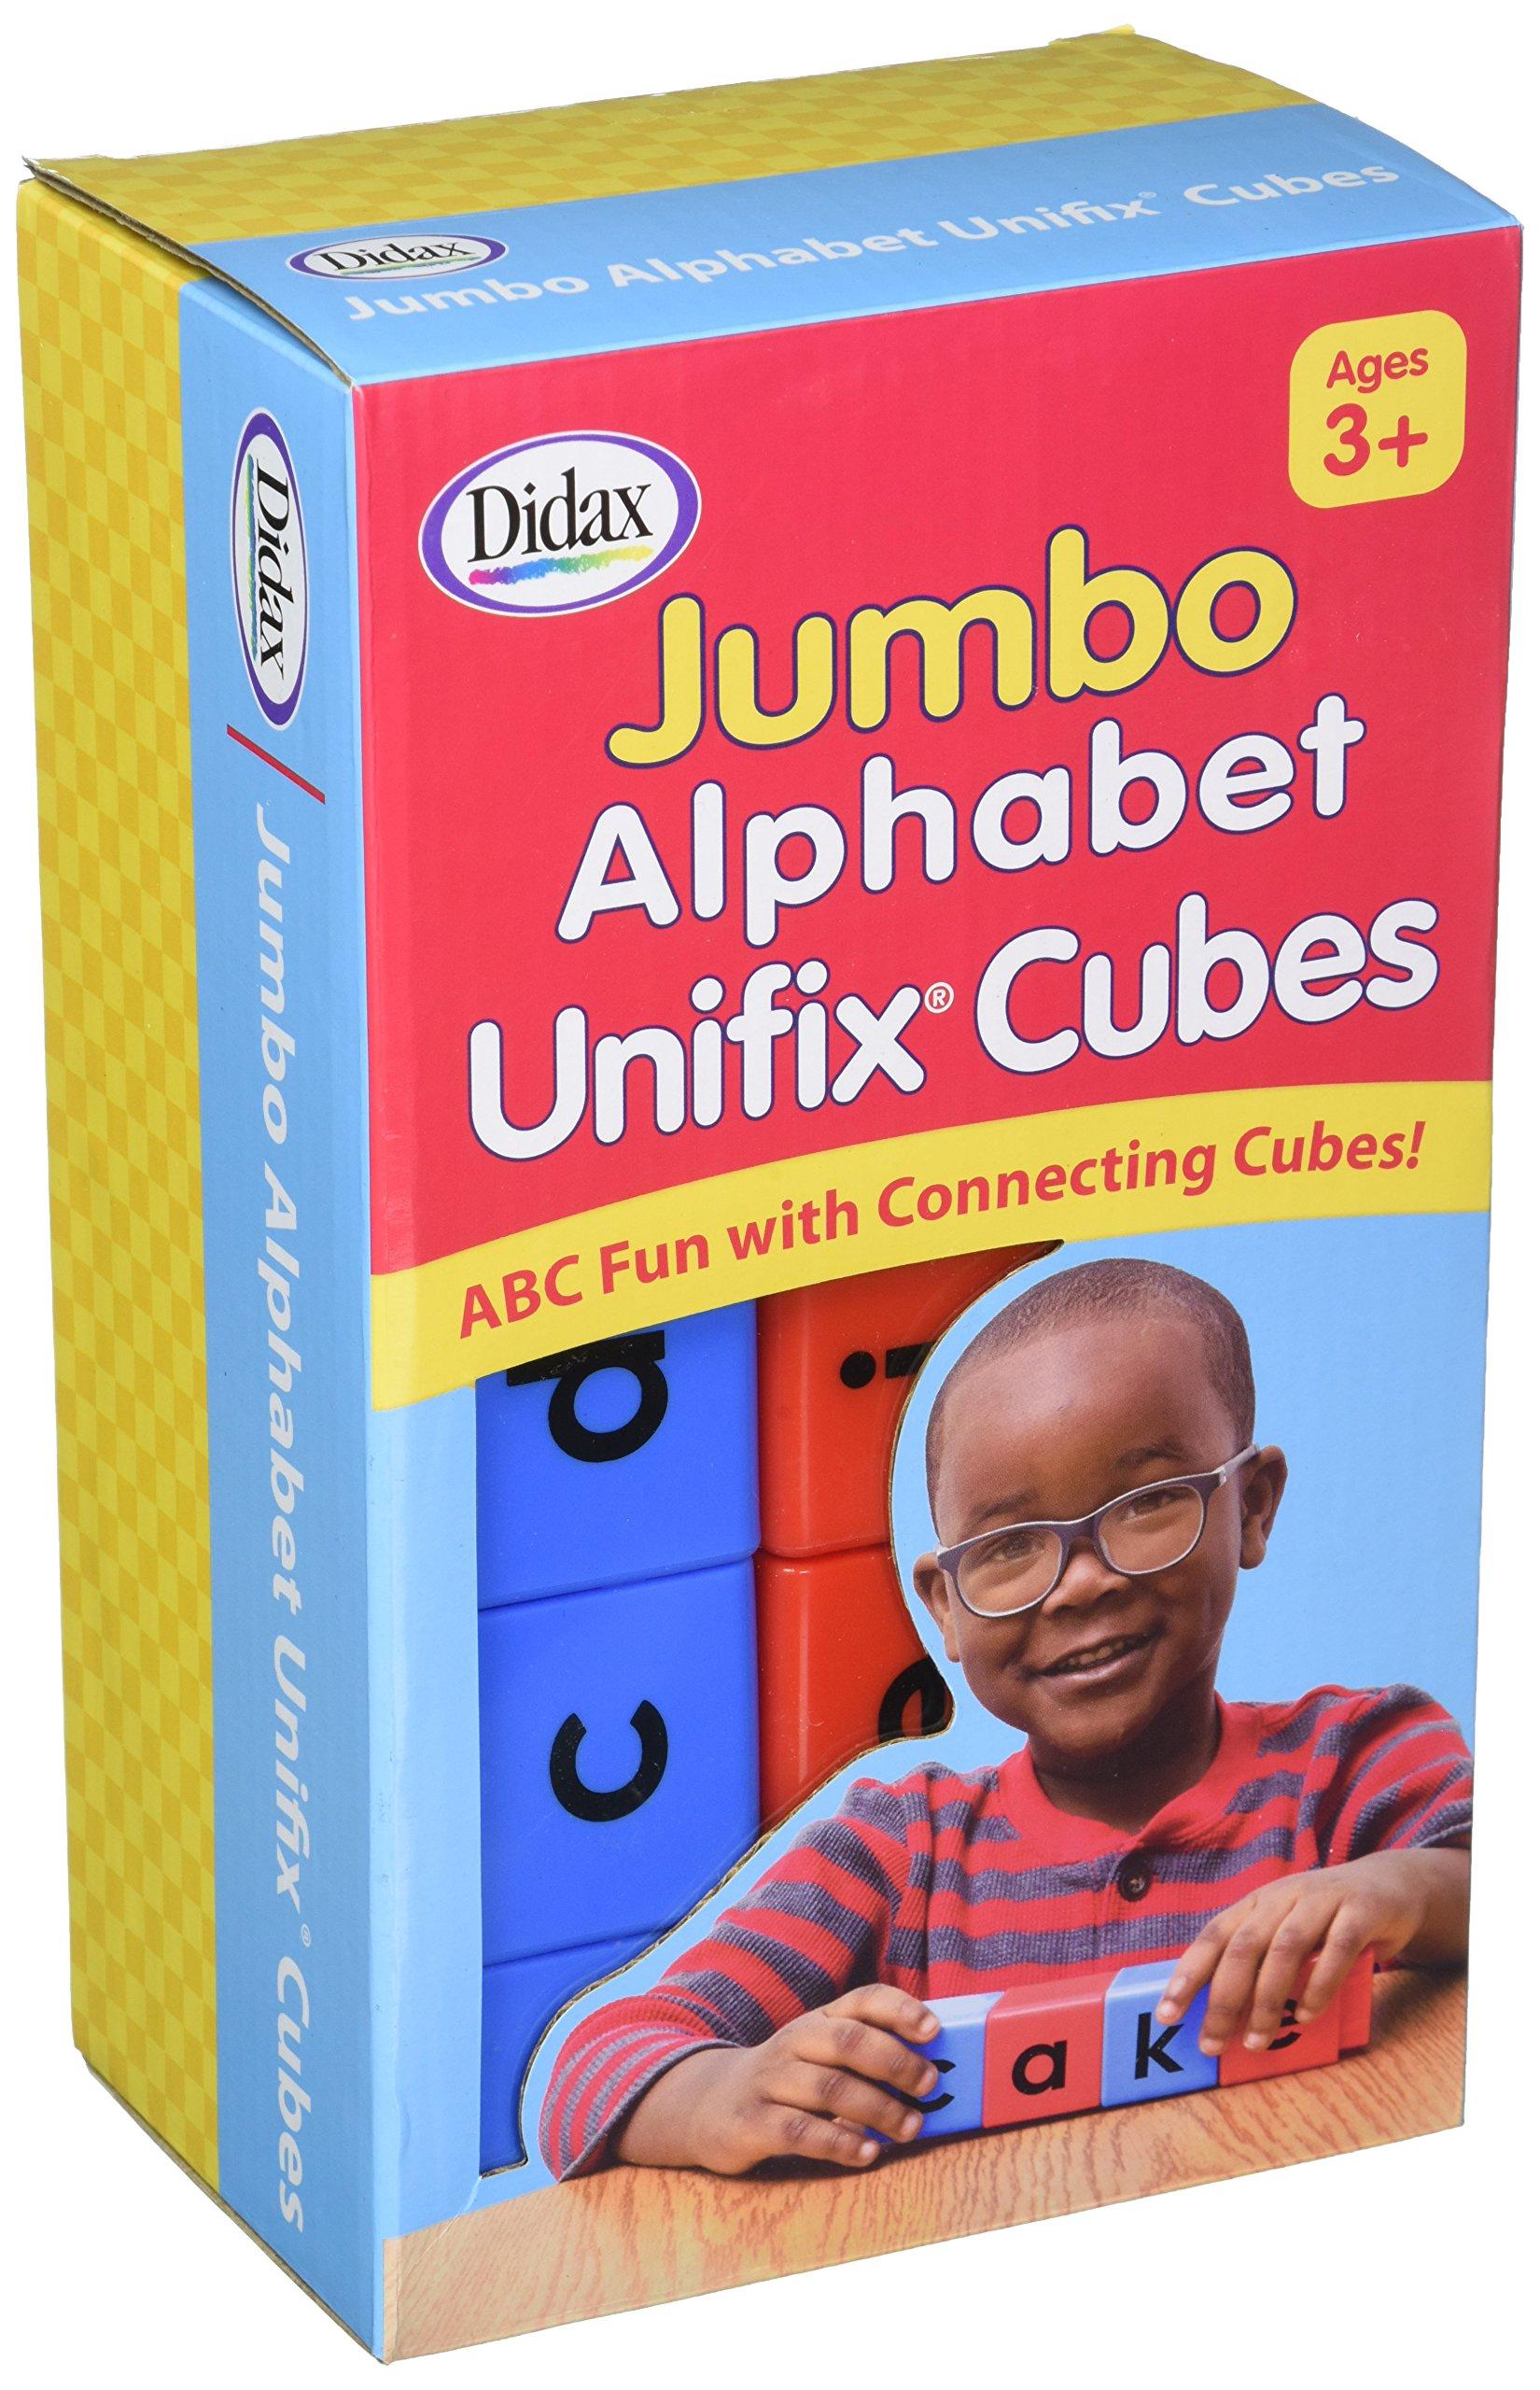 211265 Didax Jumbo Alphabet Unifix® Cubes Set of 30